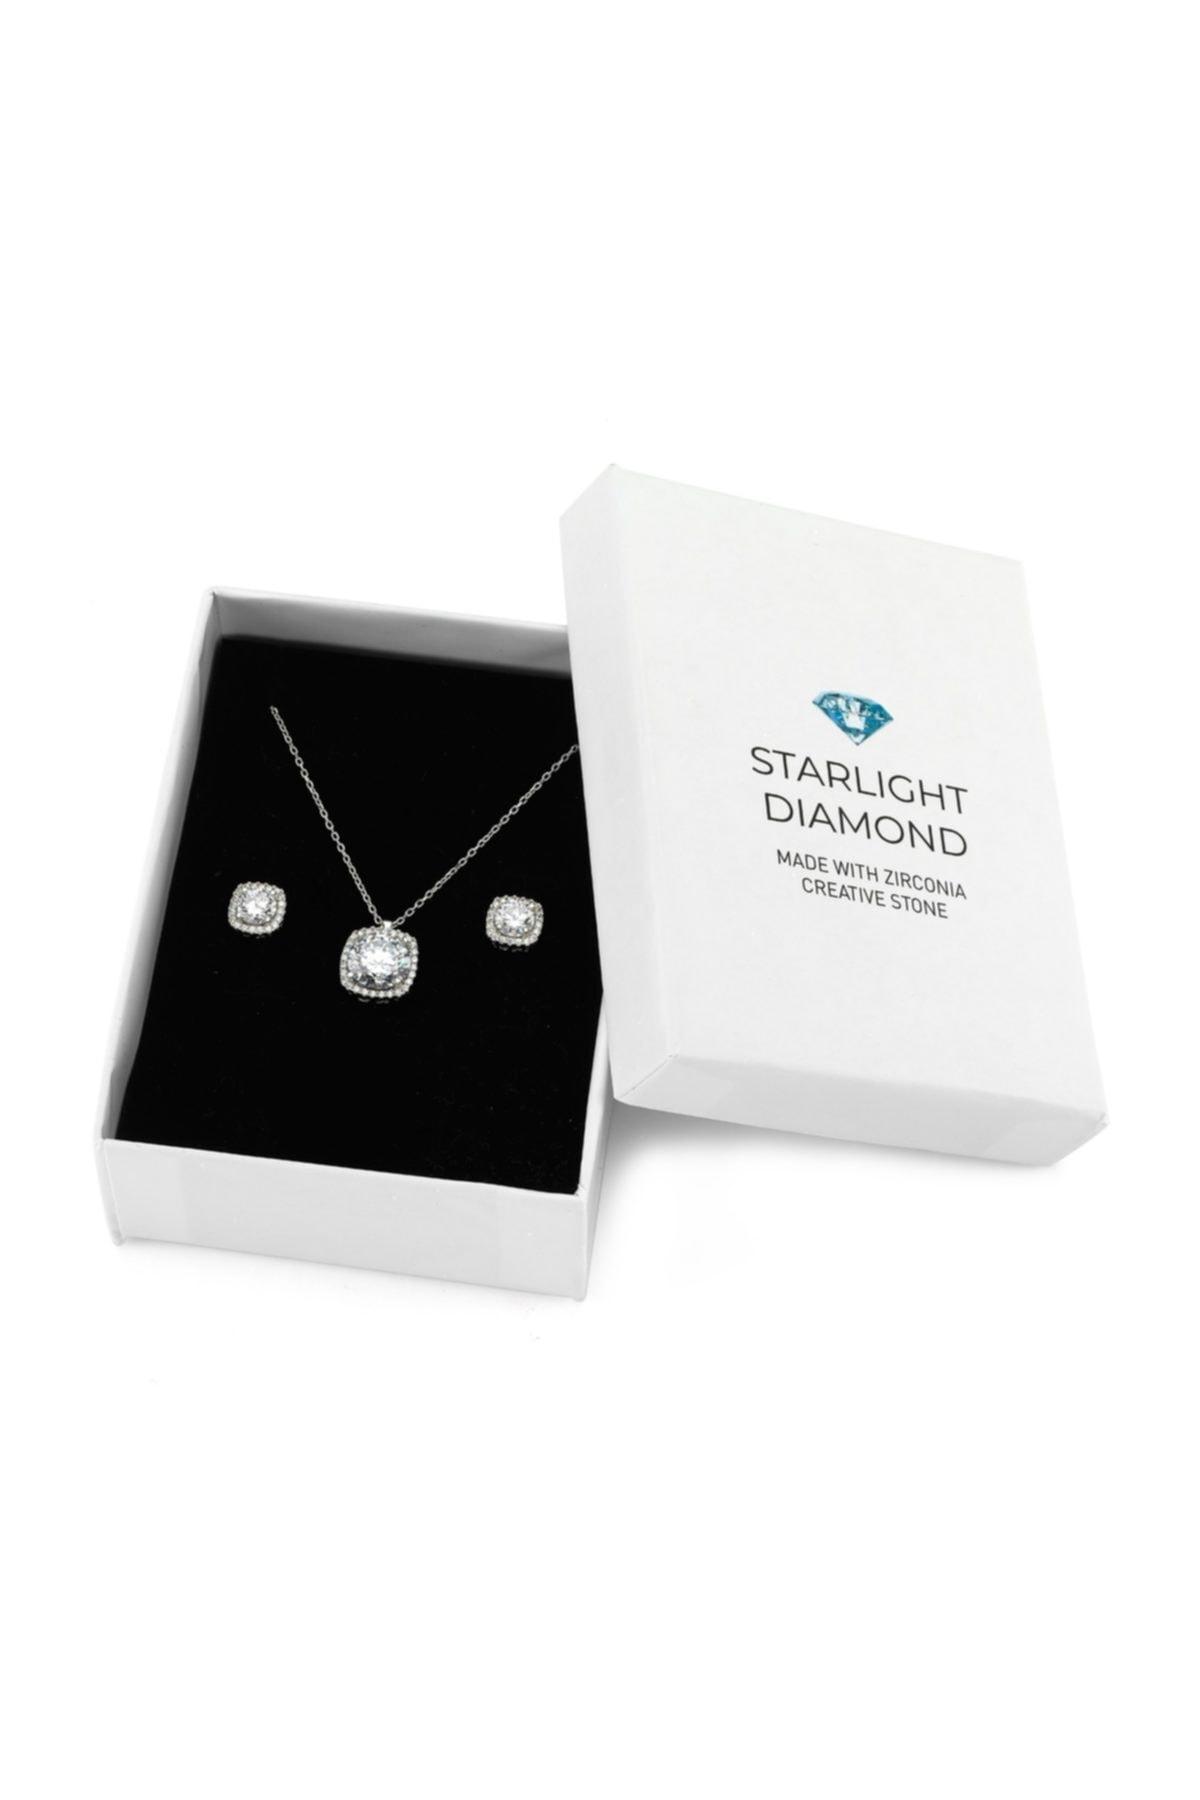 Starlight Diamond 925 Ayar Kare 2'li Gümüş Takı Seti SDSET 1